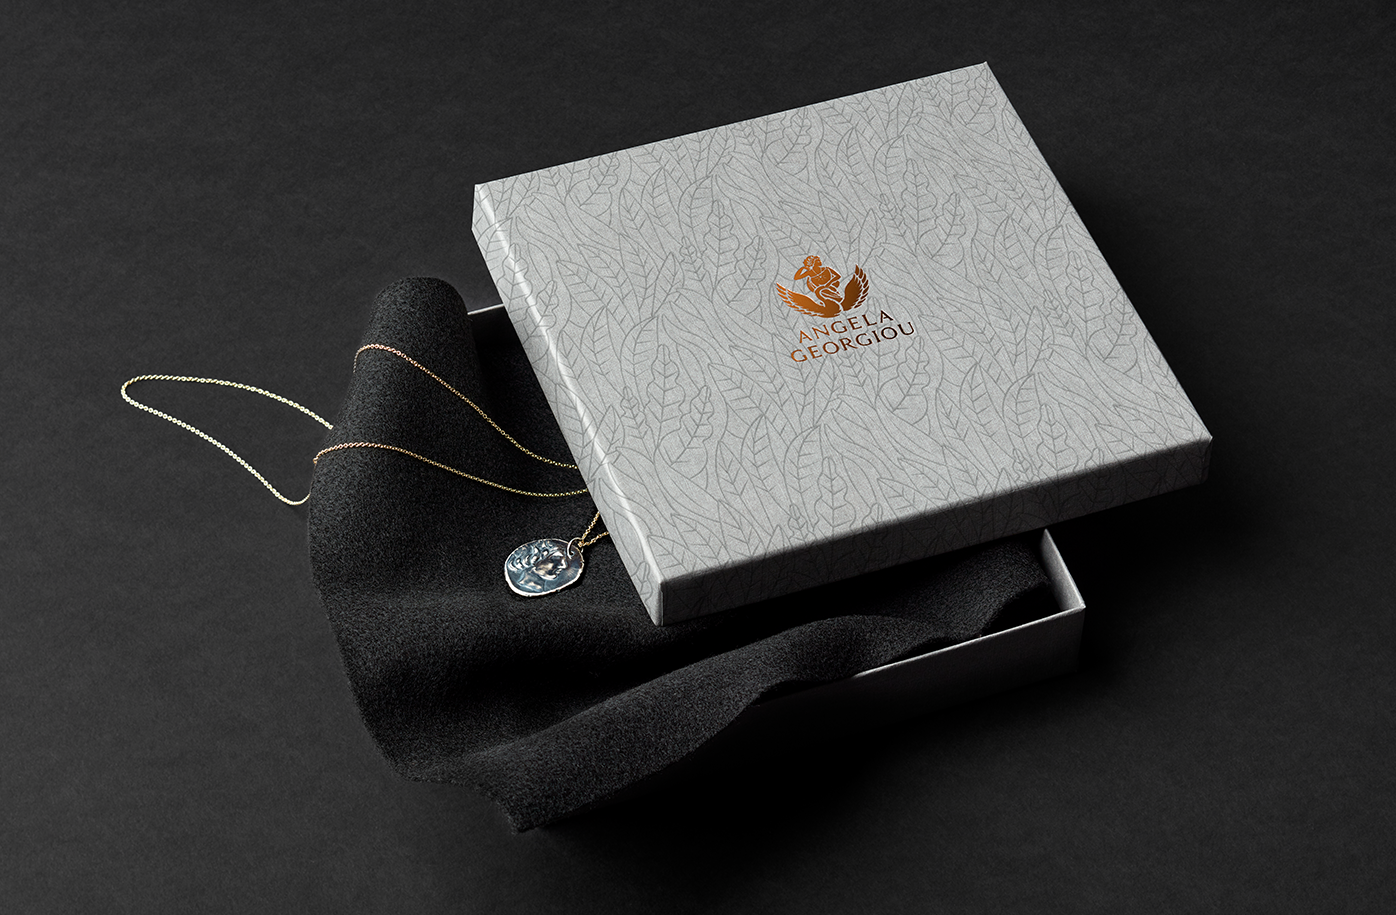 Angela-Georgiou-pattern-packaging-box-jewellery